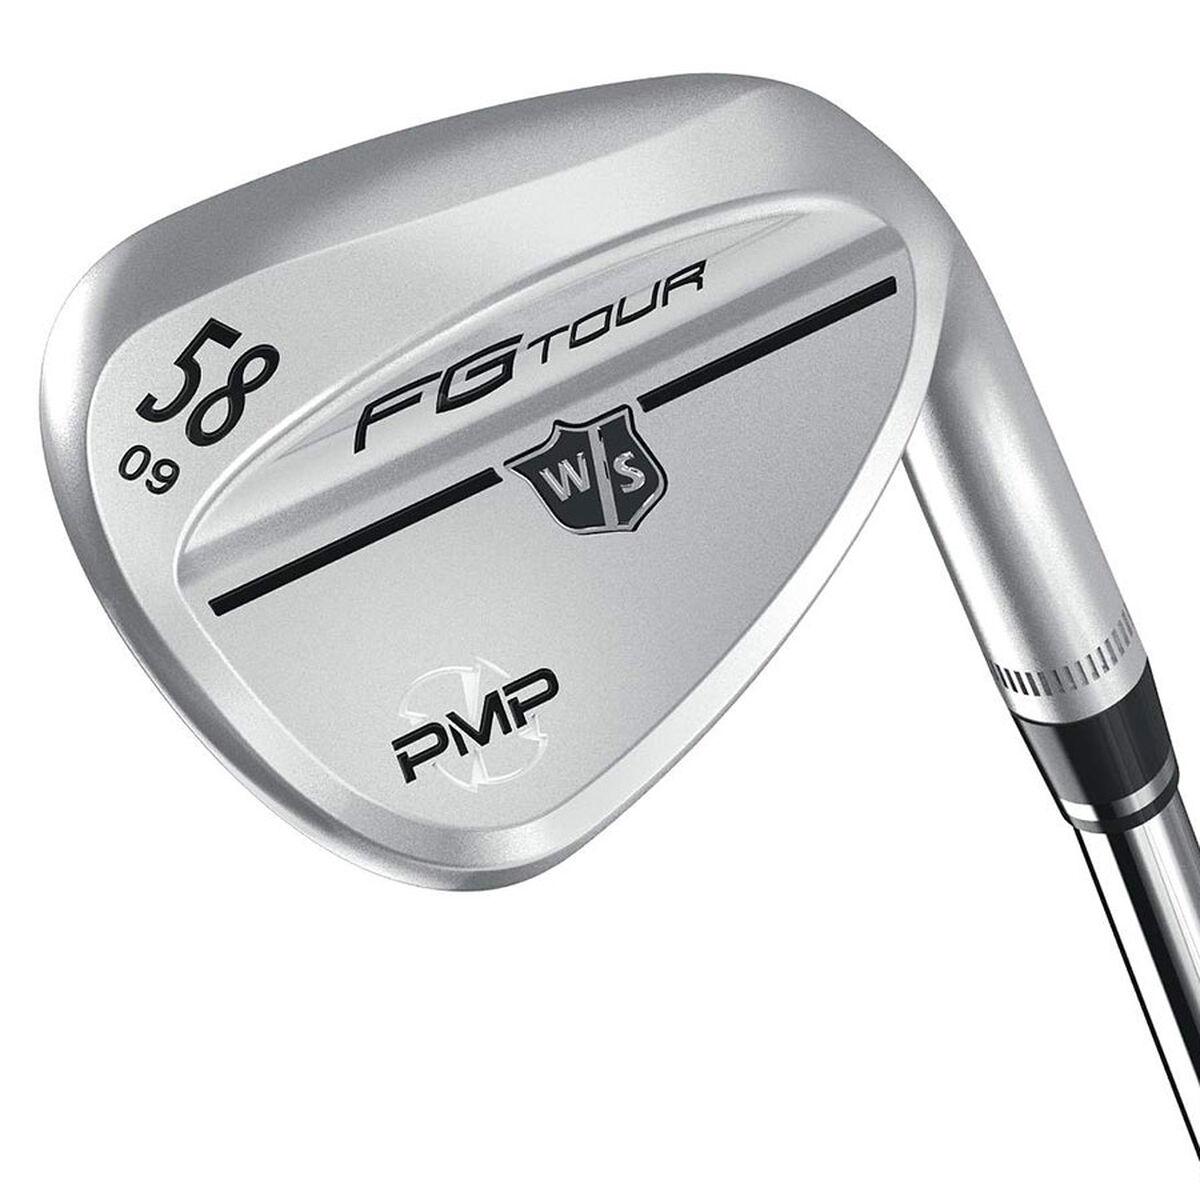 Wilson Staff FG Tour PMP Chrome Golf Wedge, Mens, Right hand, 56° | American Golf